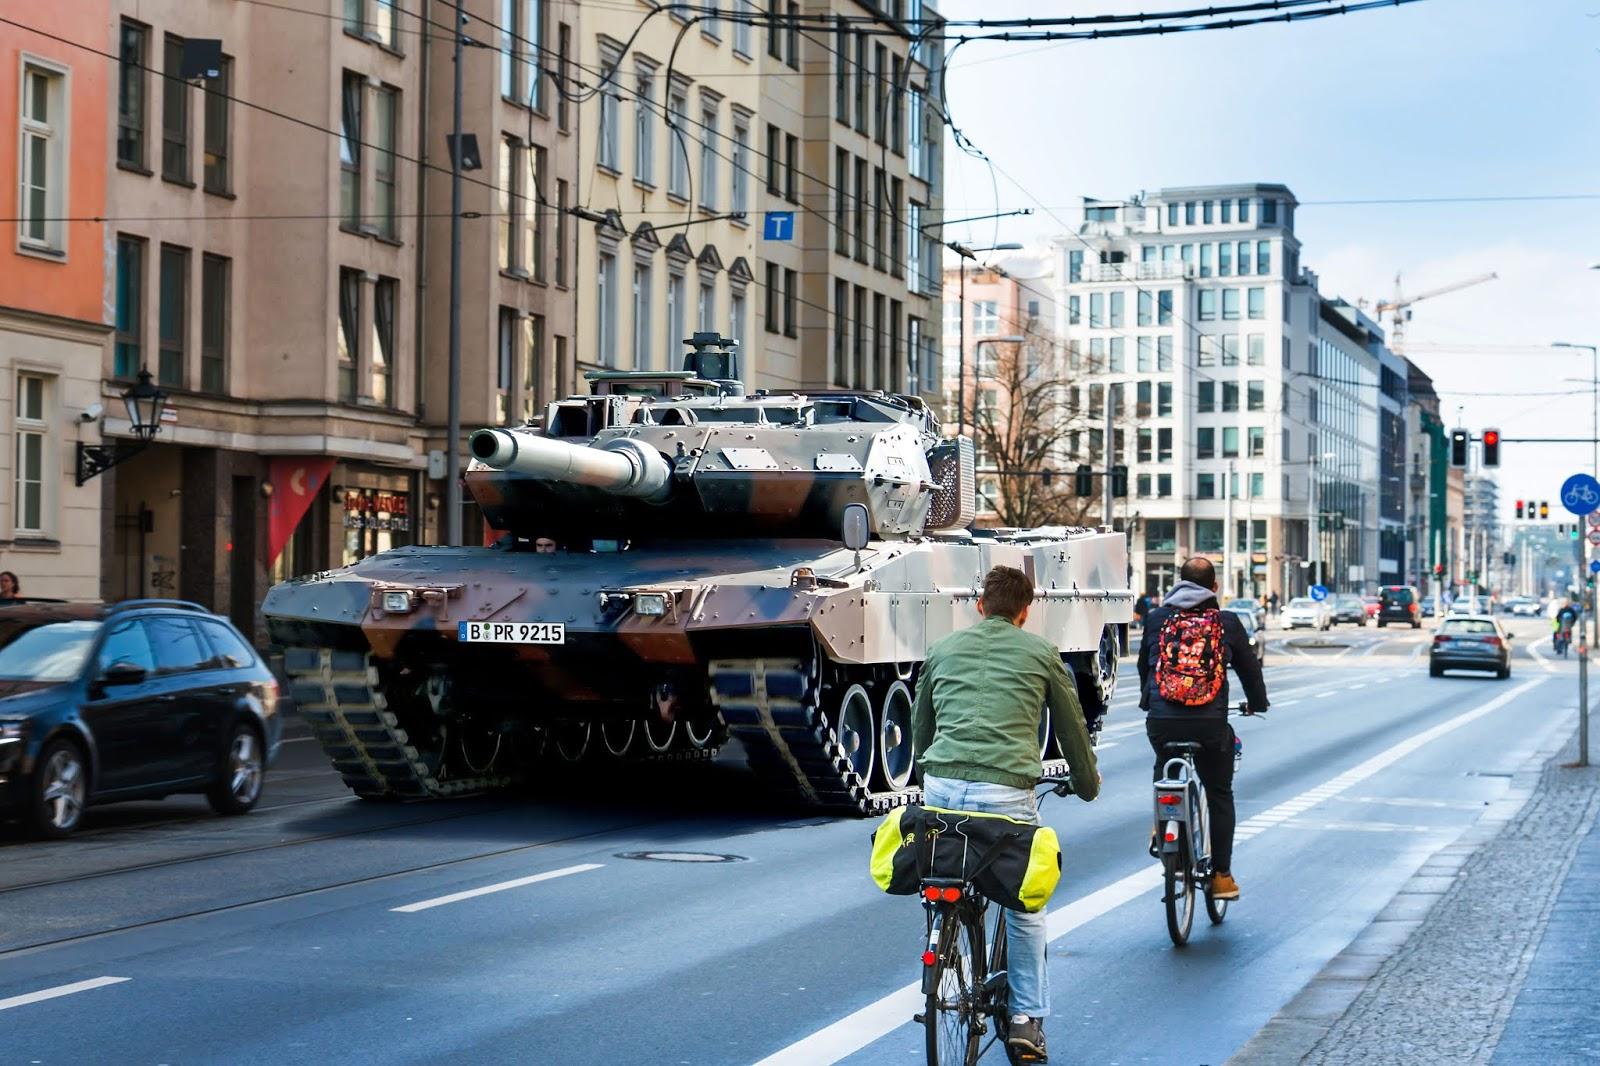 [Obrazek: Panzer.jpg]